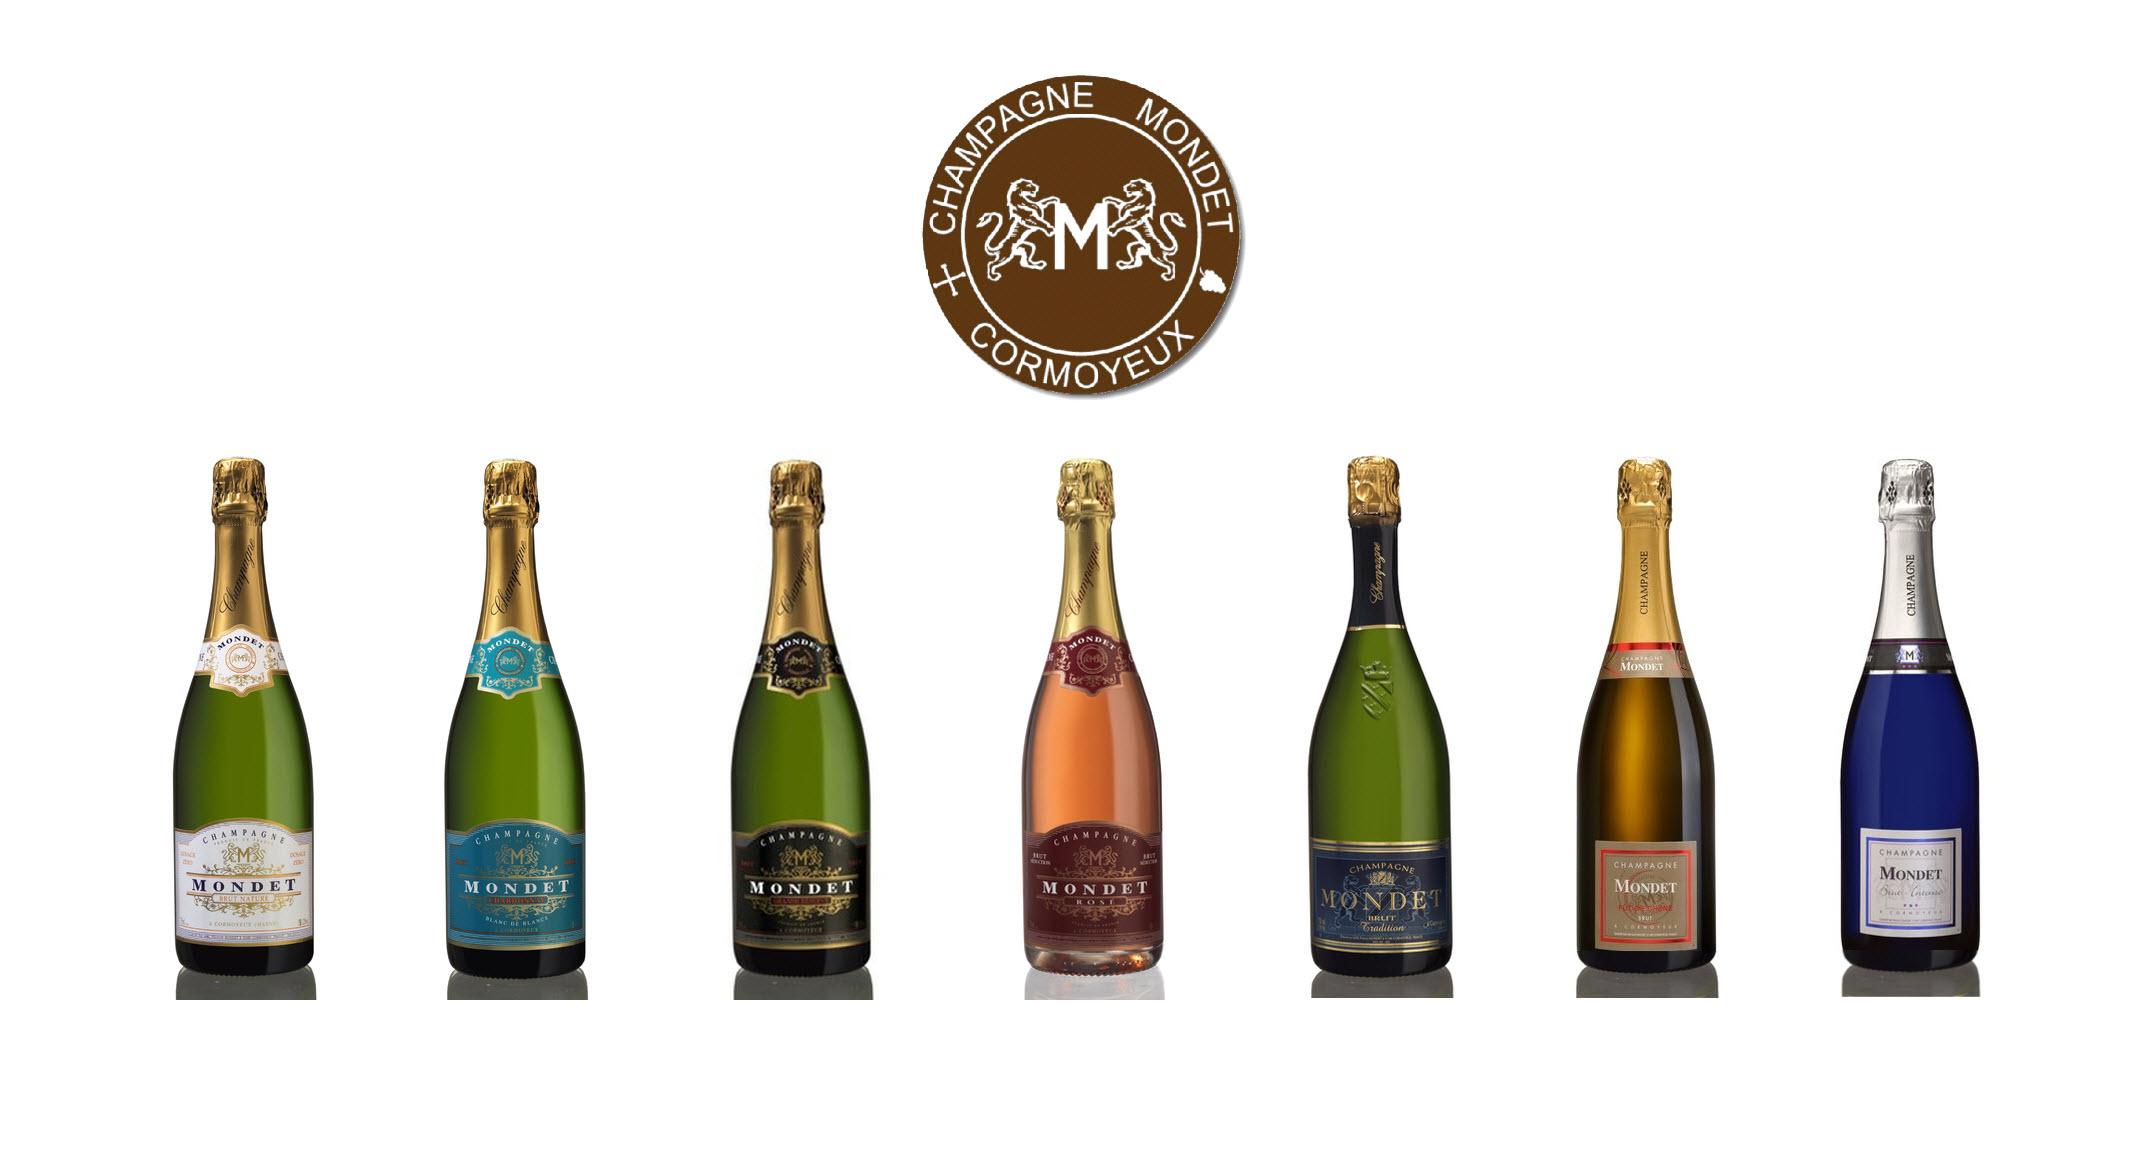 Champagne Mondet